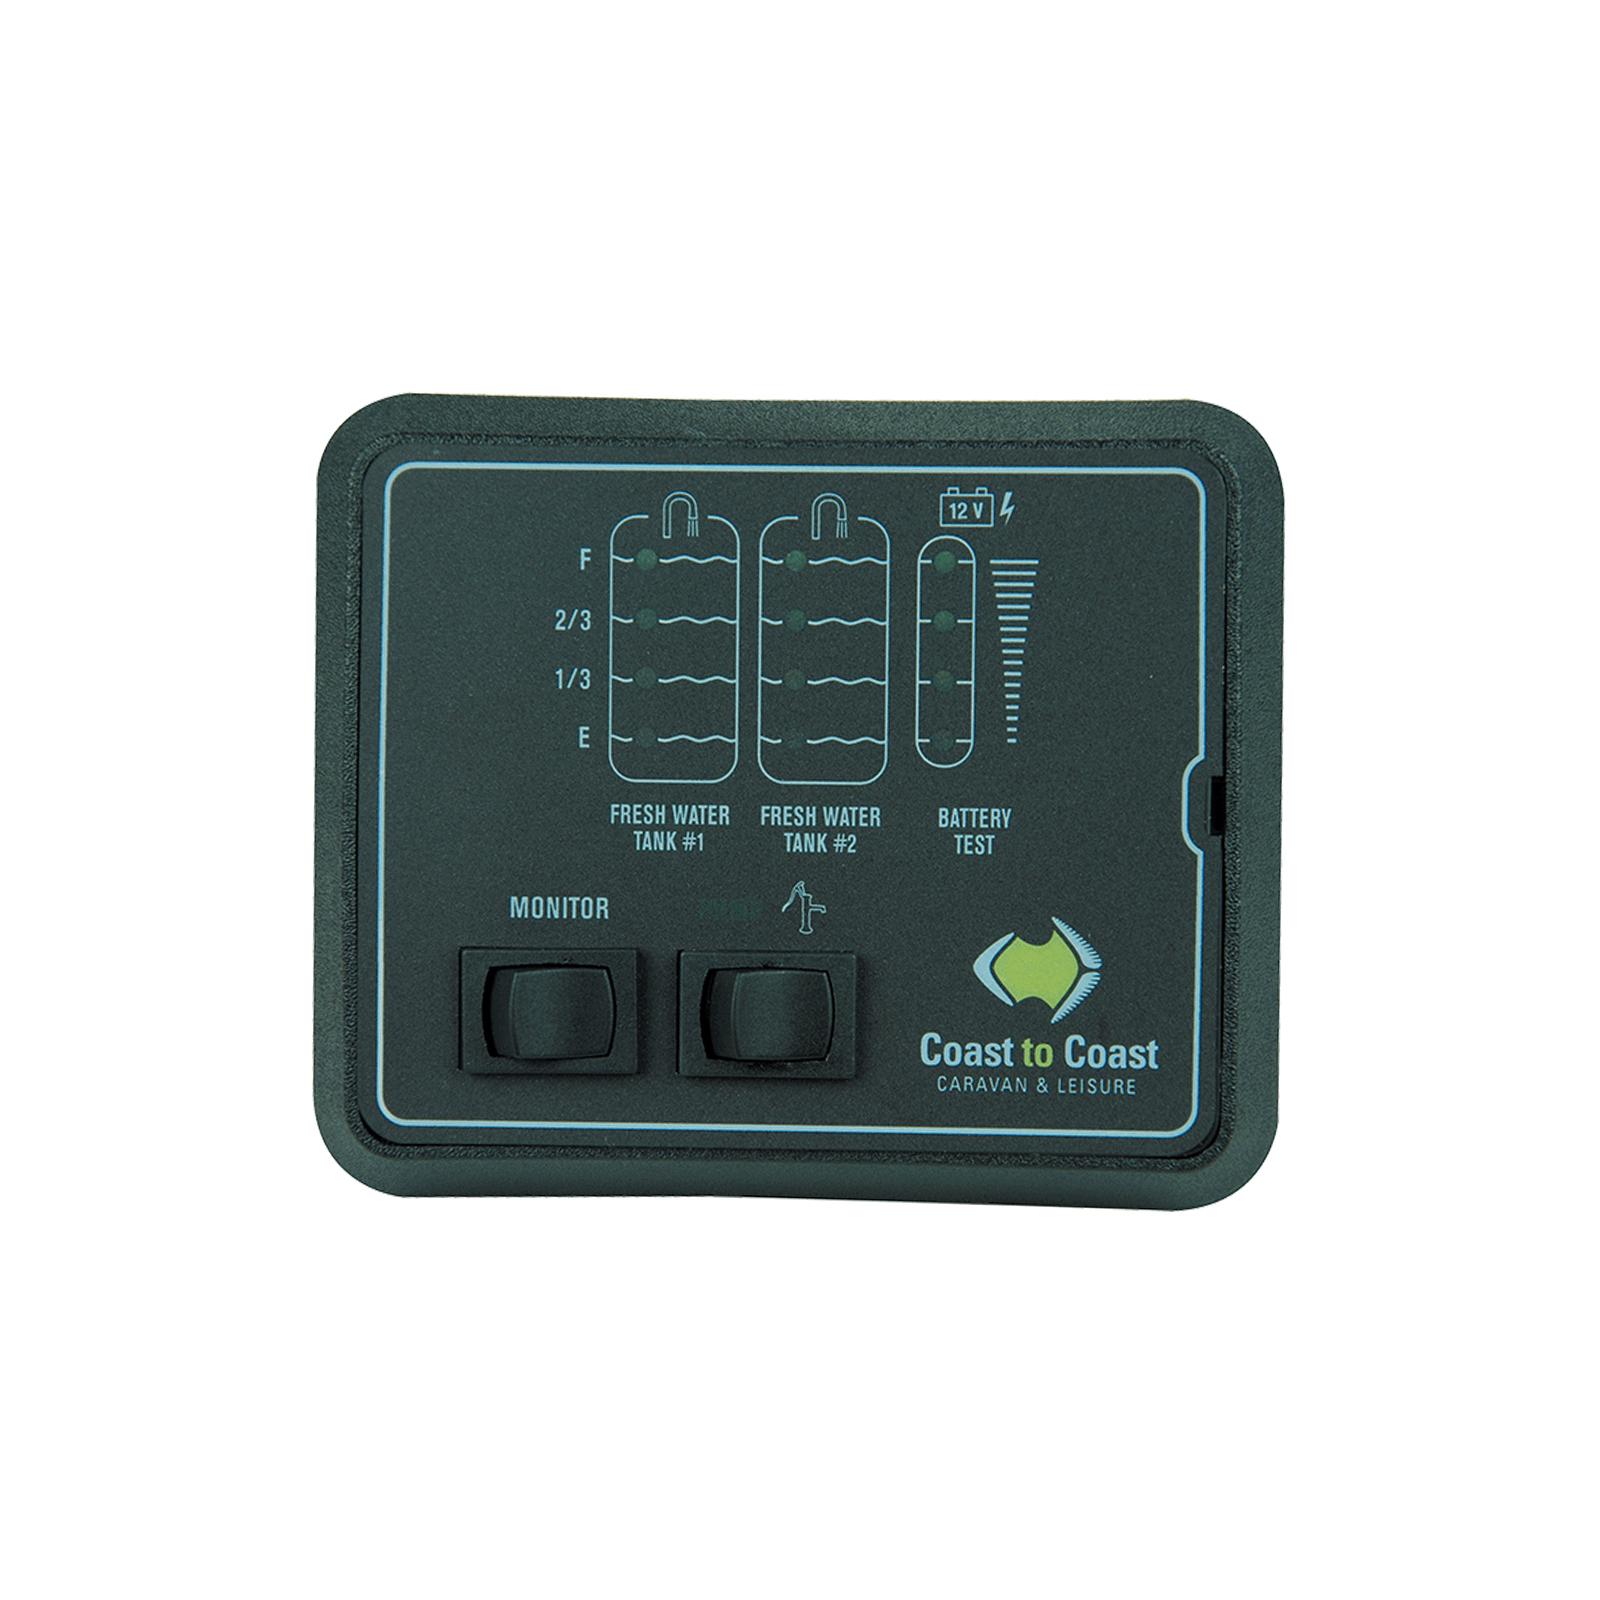 Jrv 2 Water Tank Battery Level Indicator Caravan Gauge W